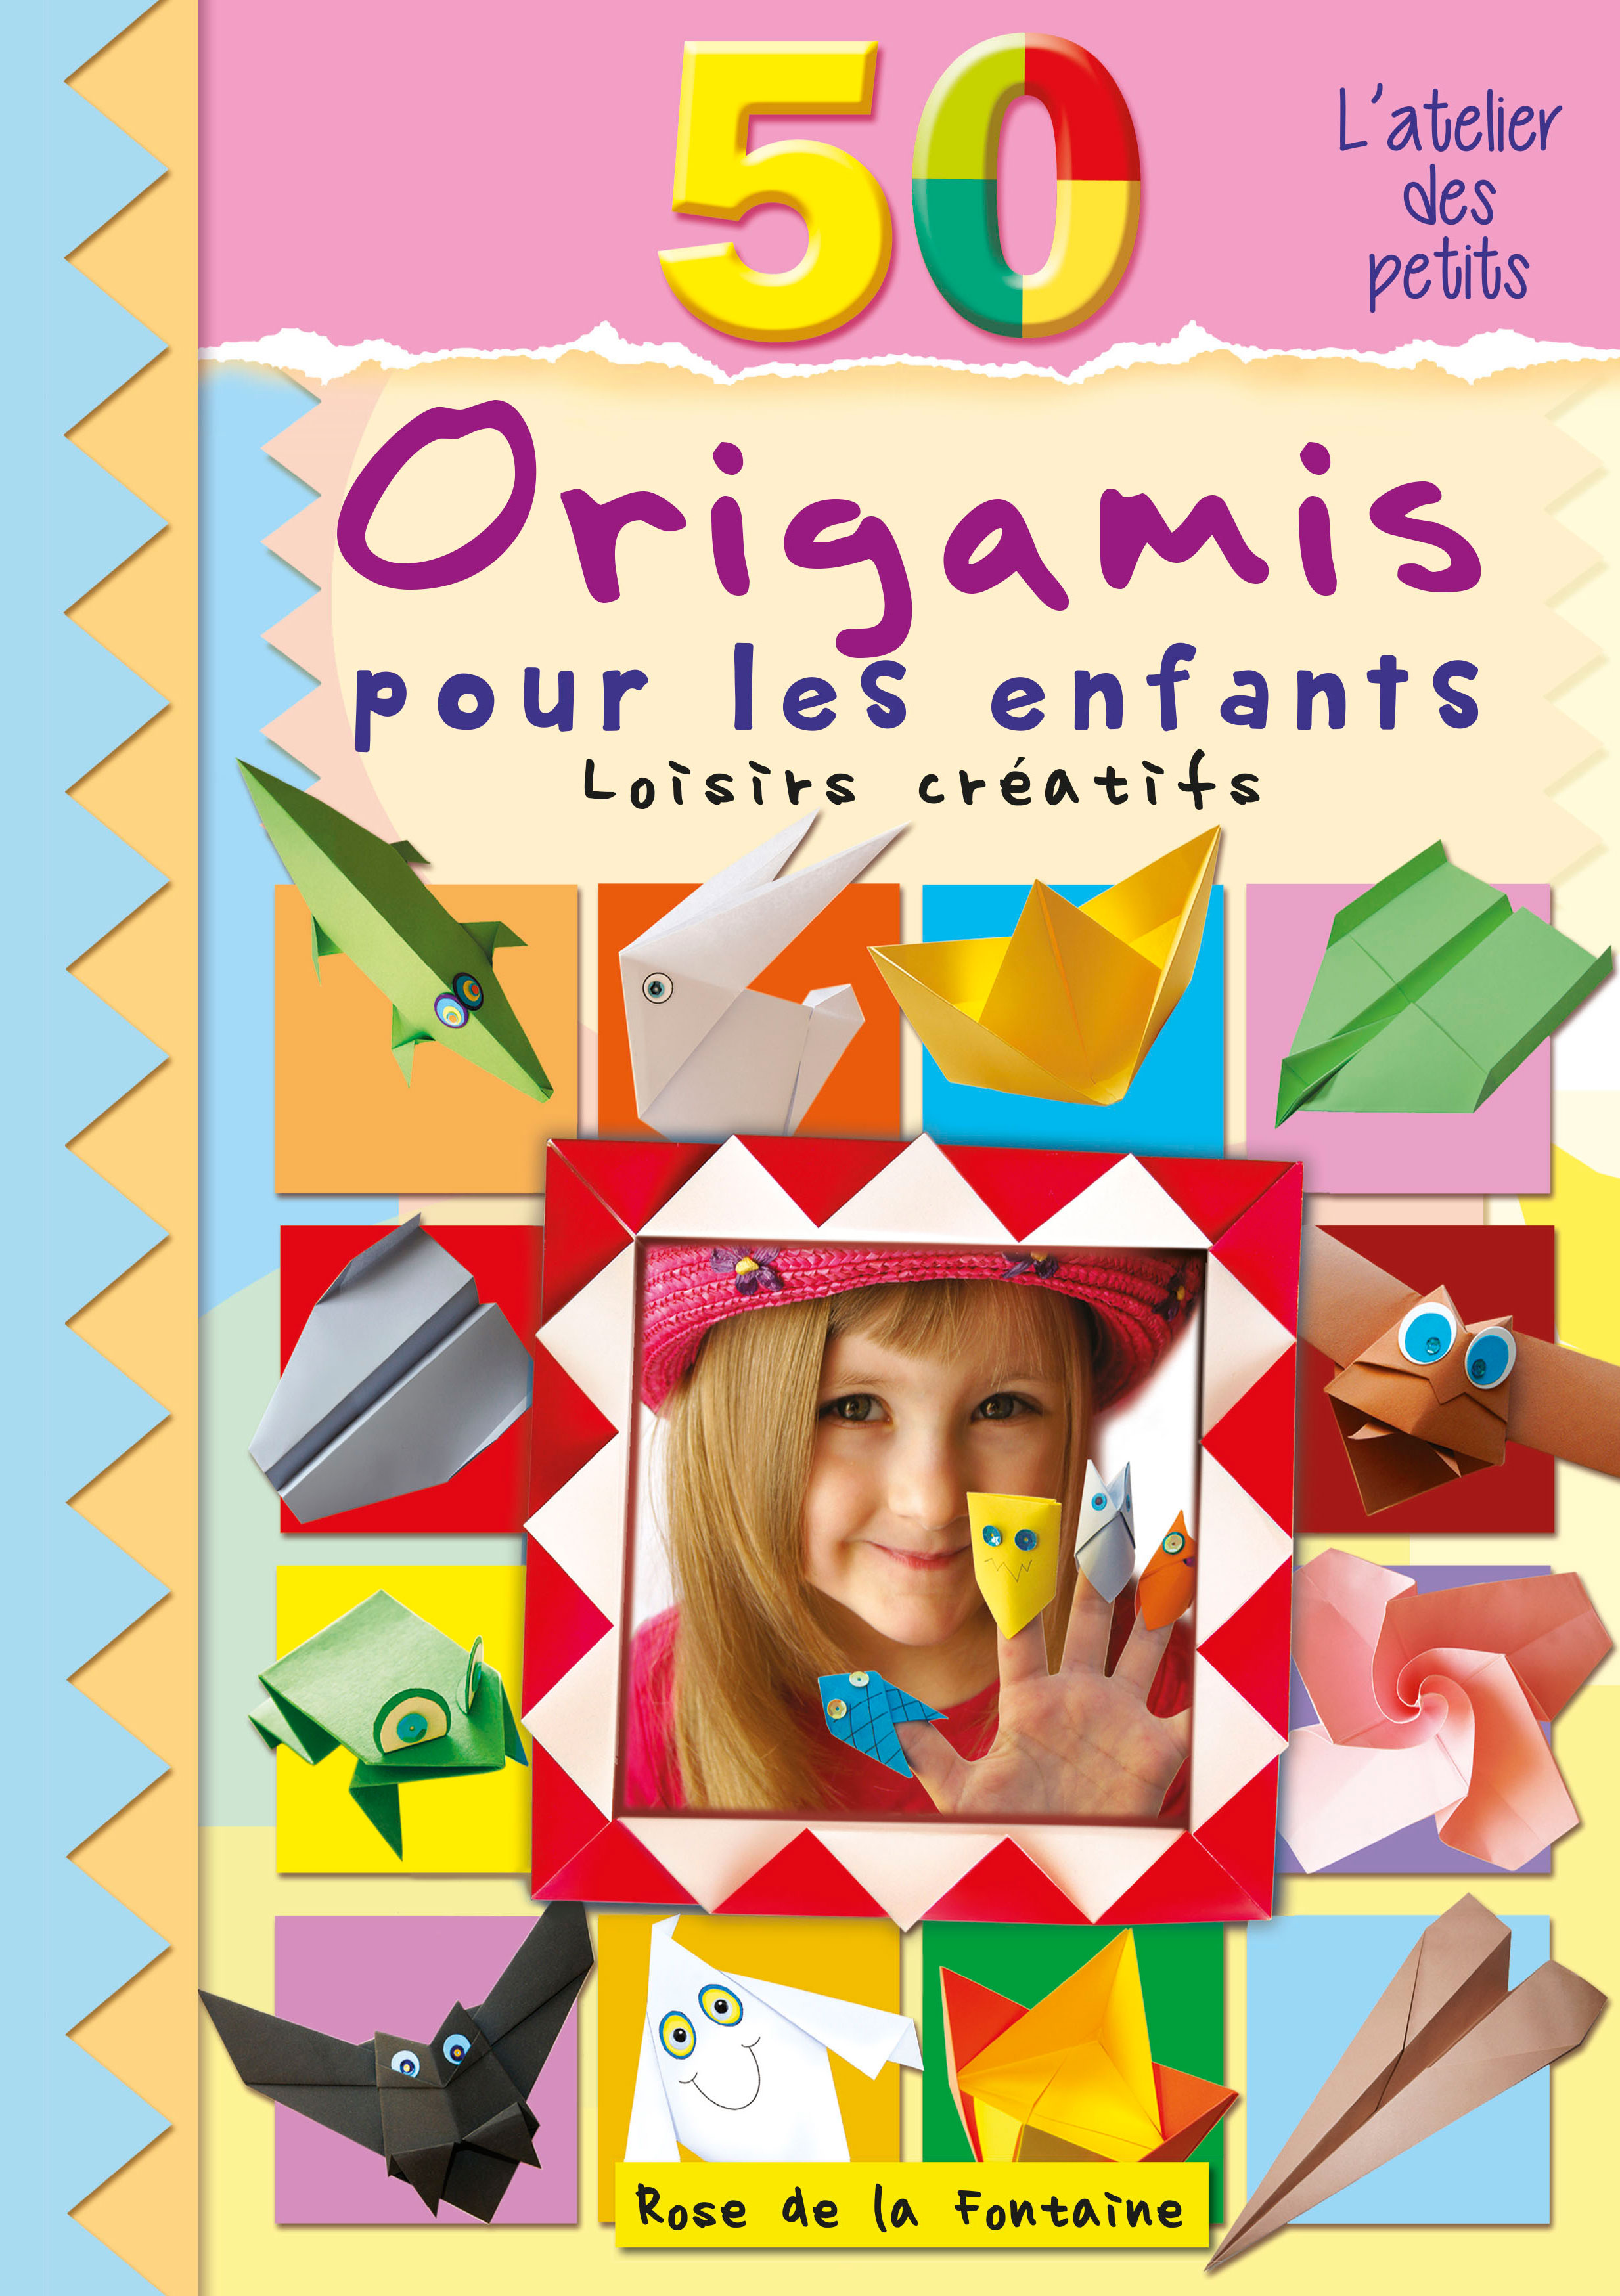 50 origamis pour les enfants. Black Bedroom Furniture Sets. Home Design Ideas